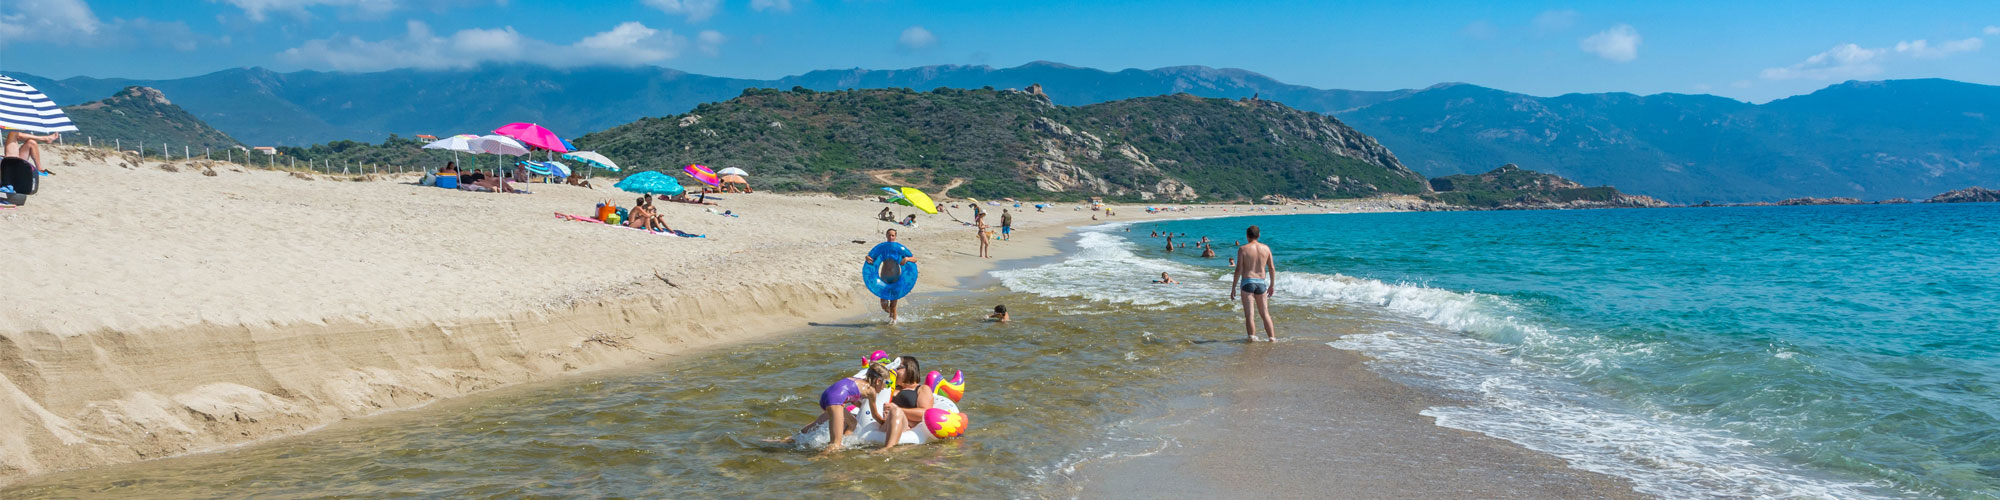 Paradisu - Korsika - Corse - Liamone